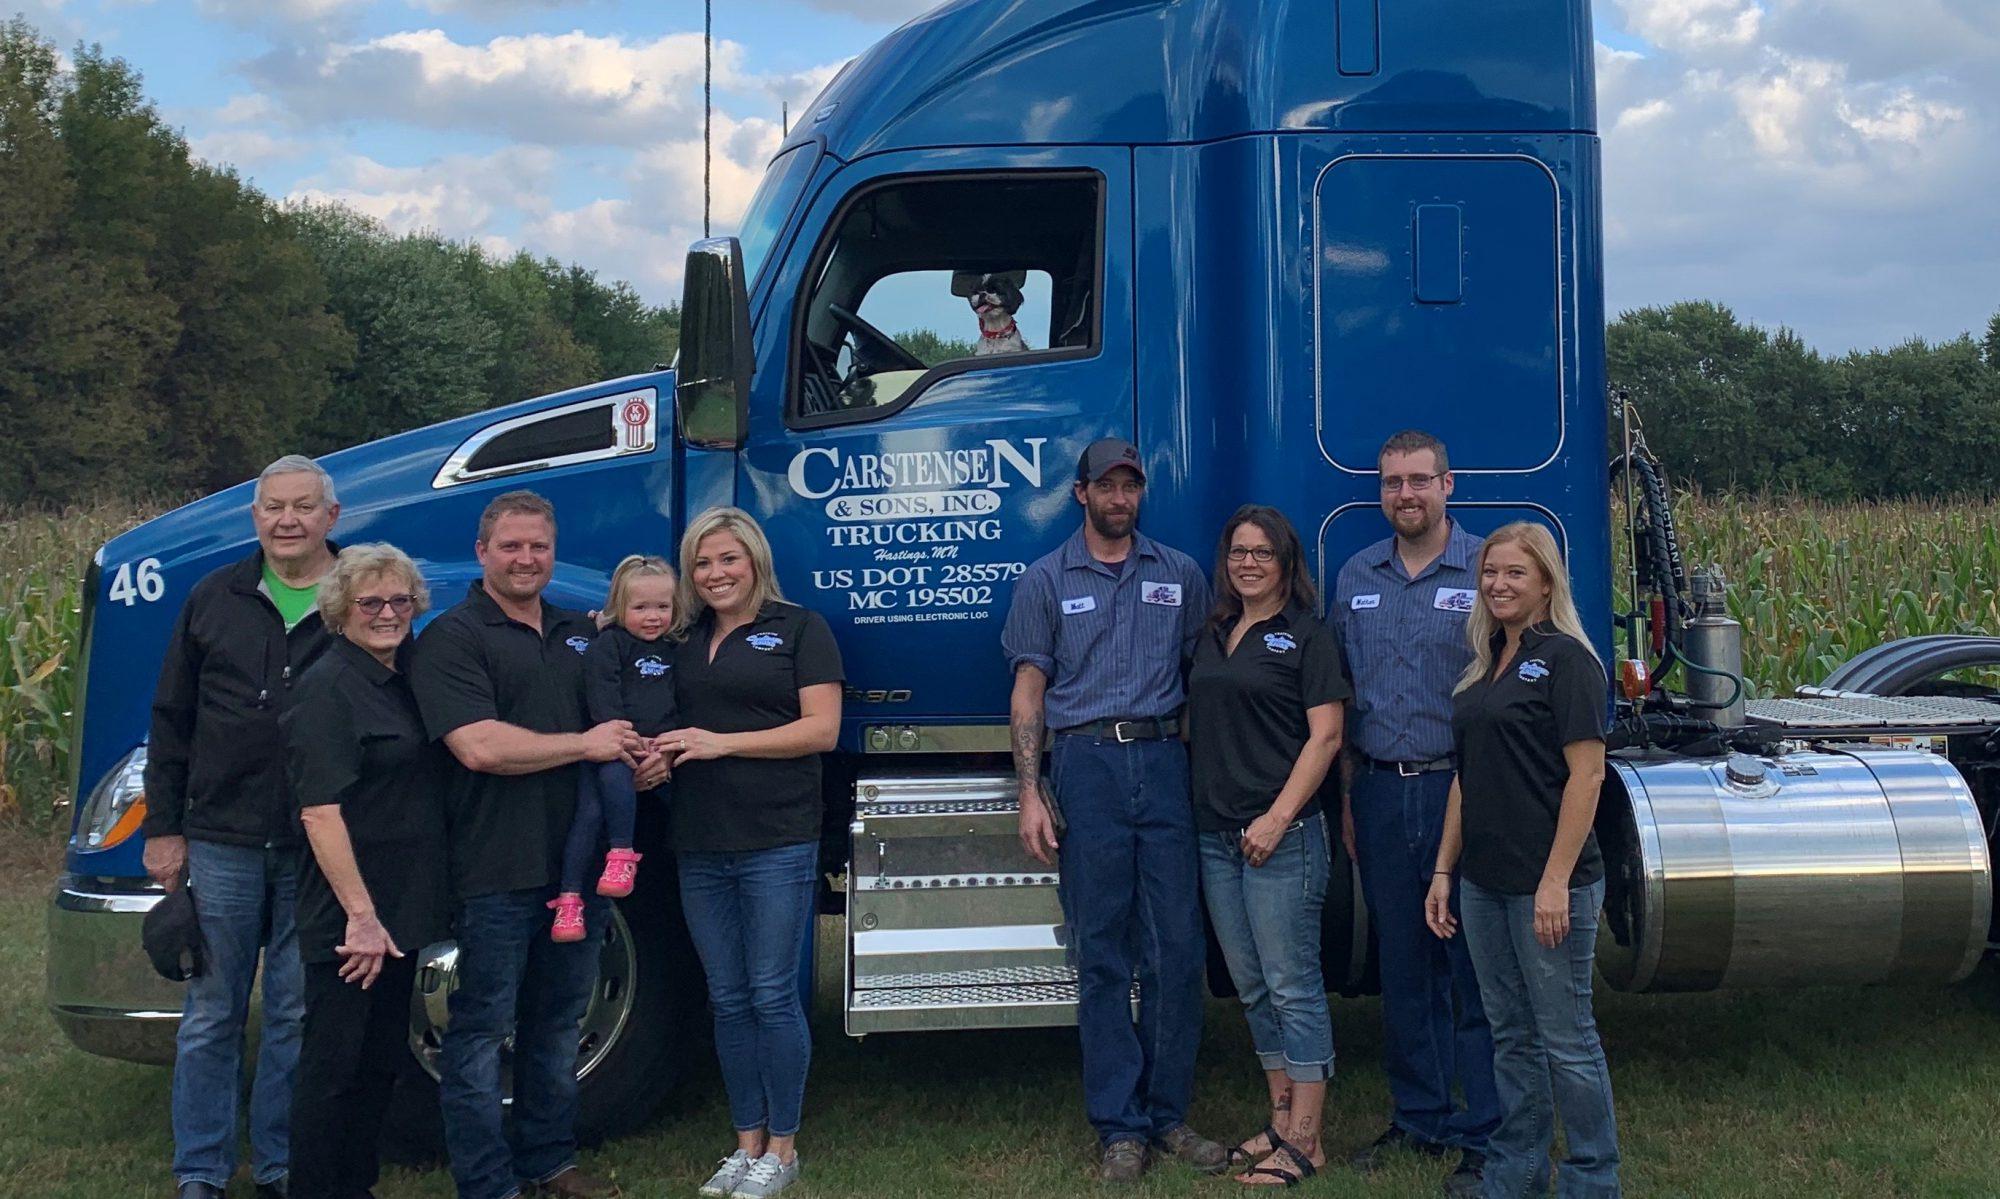 Carstensen & Sons Trucking, Inc.